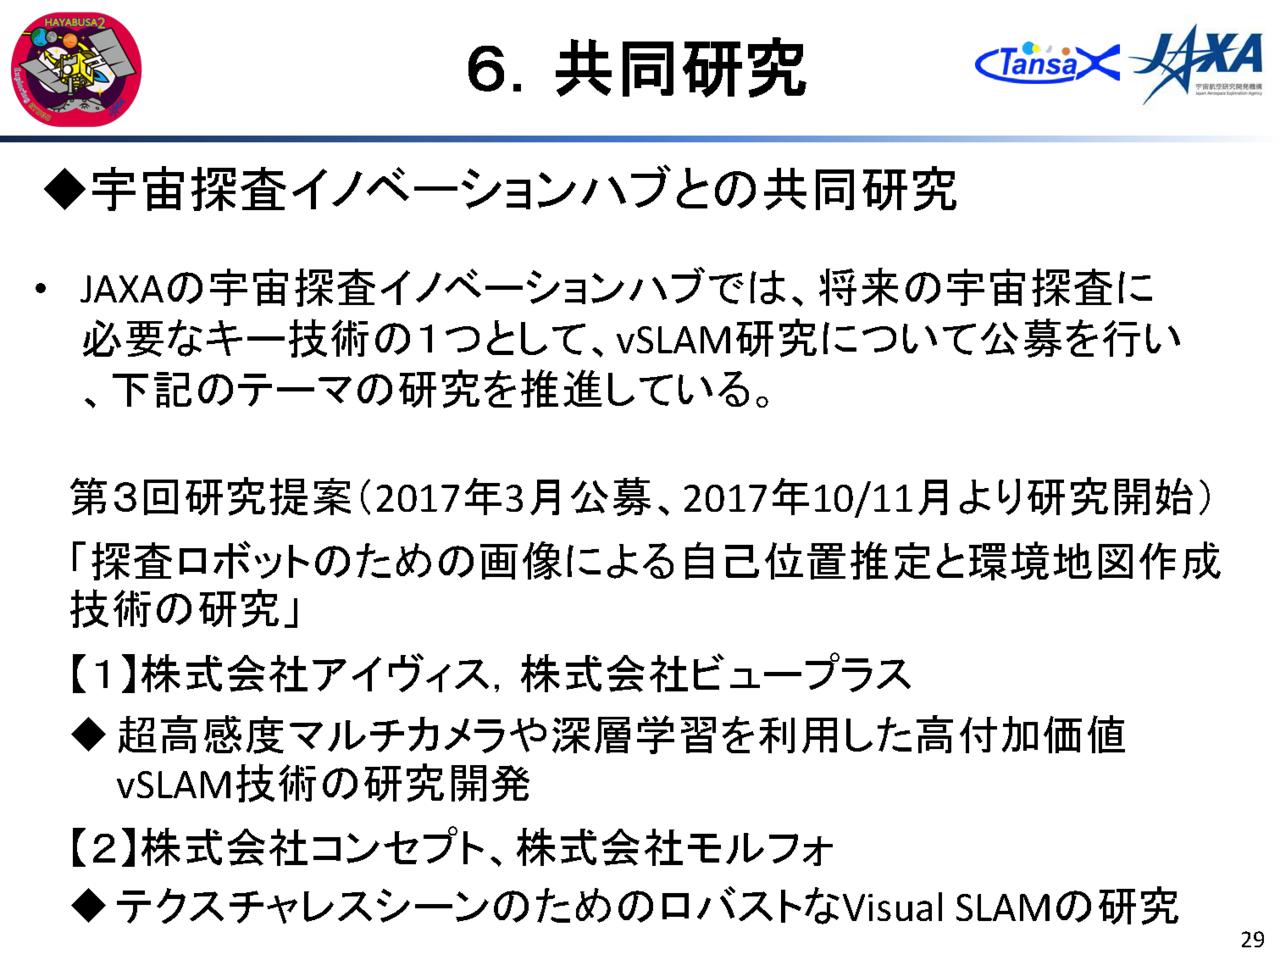 f:id:Imamura:20180802145949p:plain